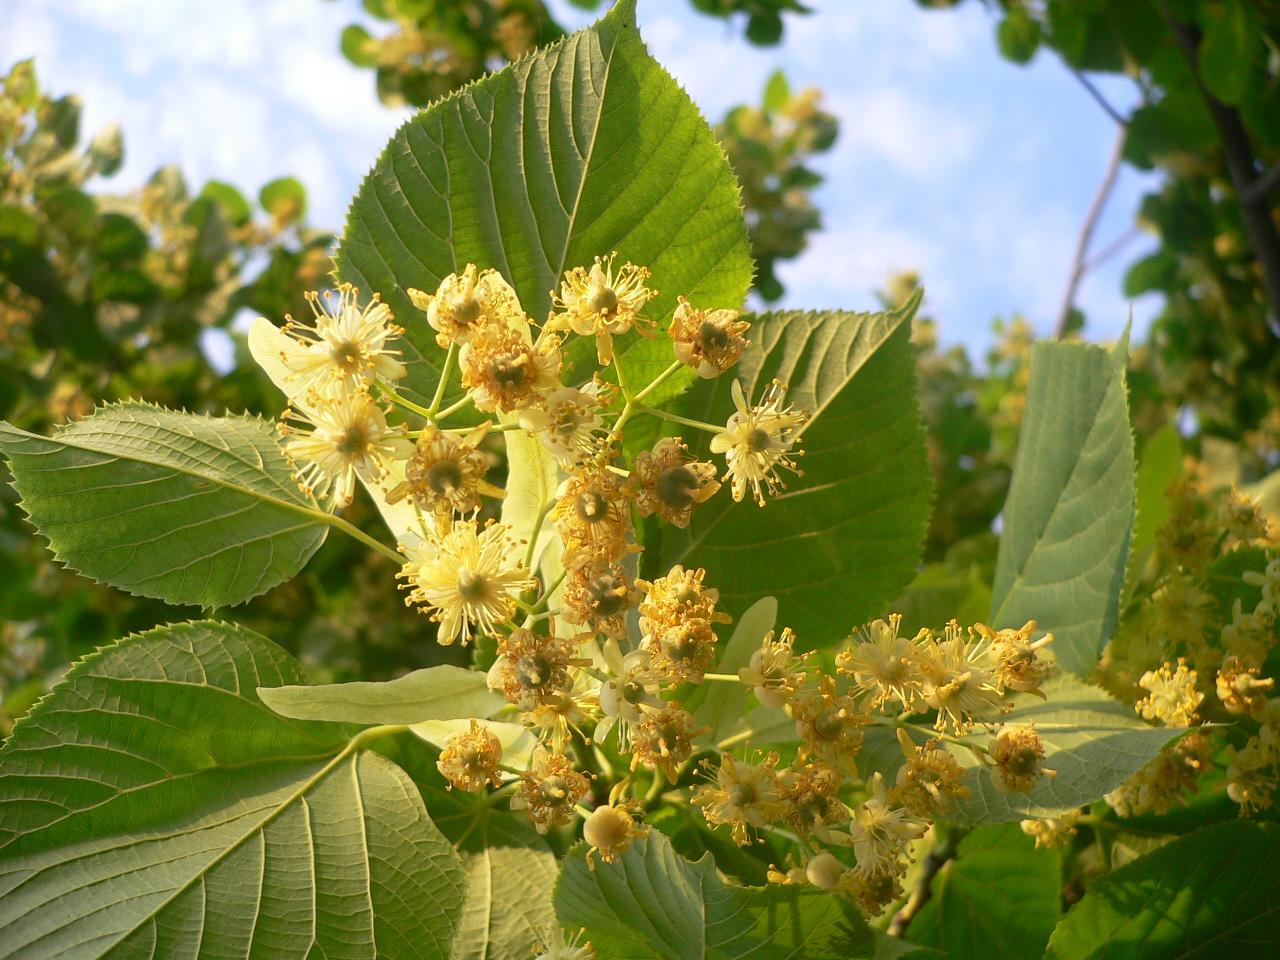 Albero di Tiglio - Tilia platyphyllos (Linden Tree)